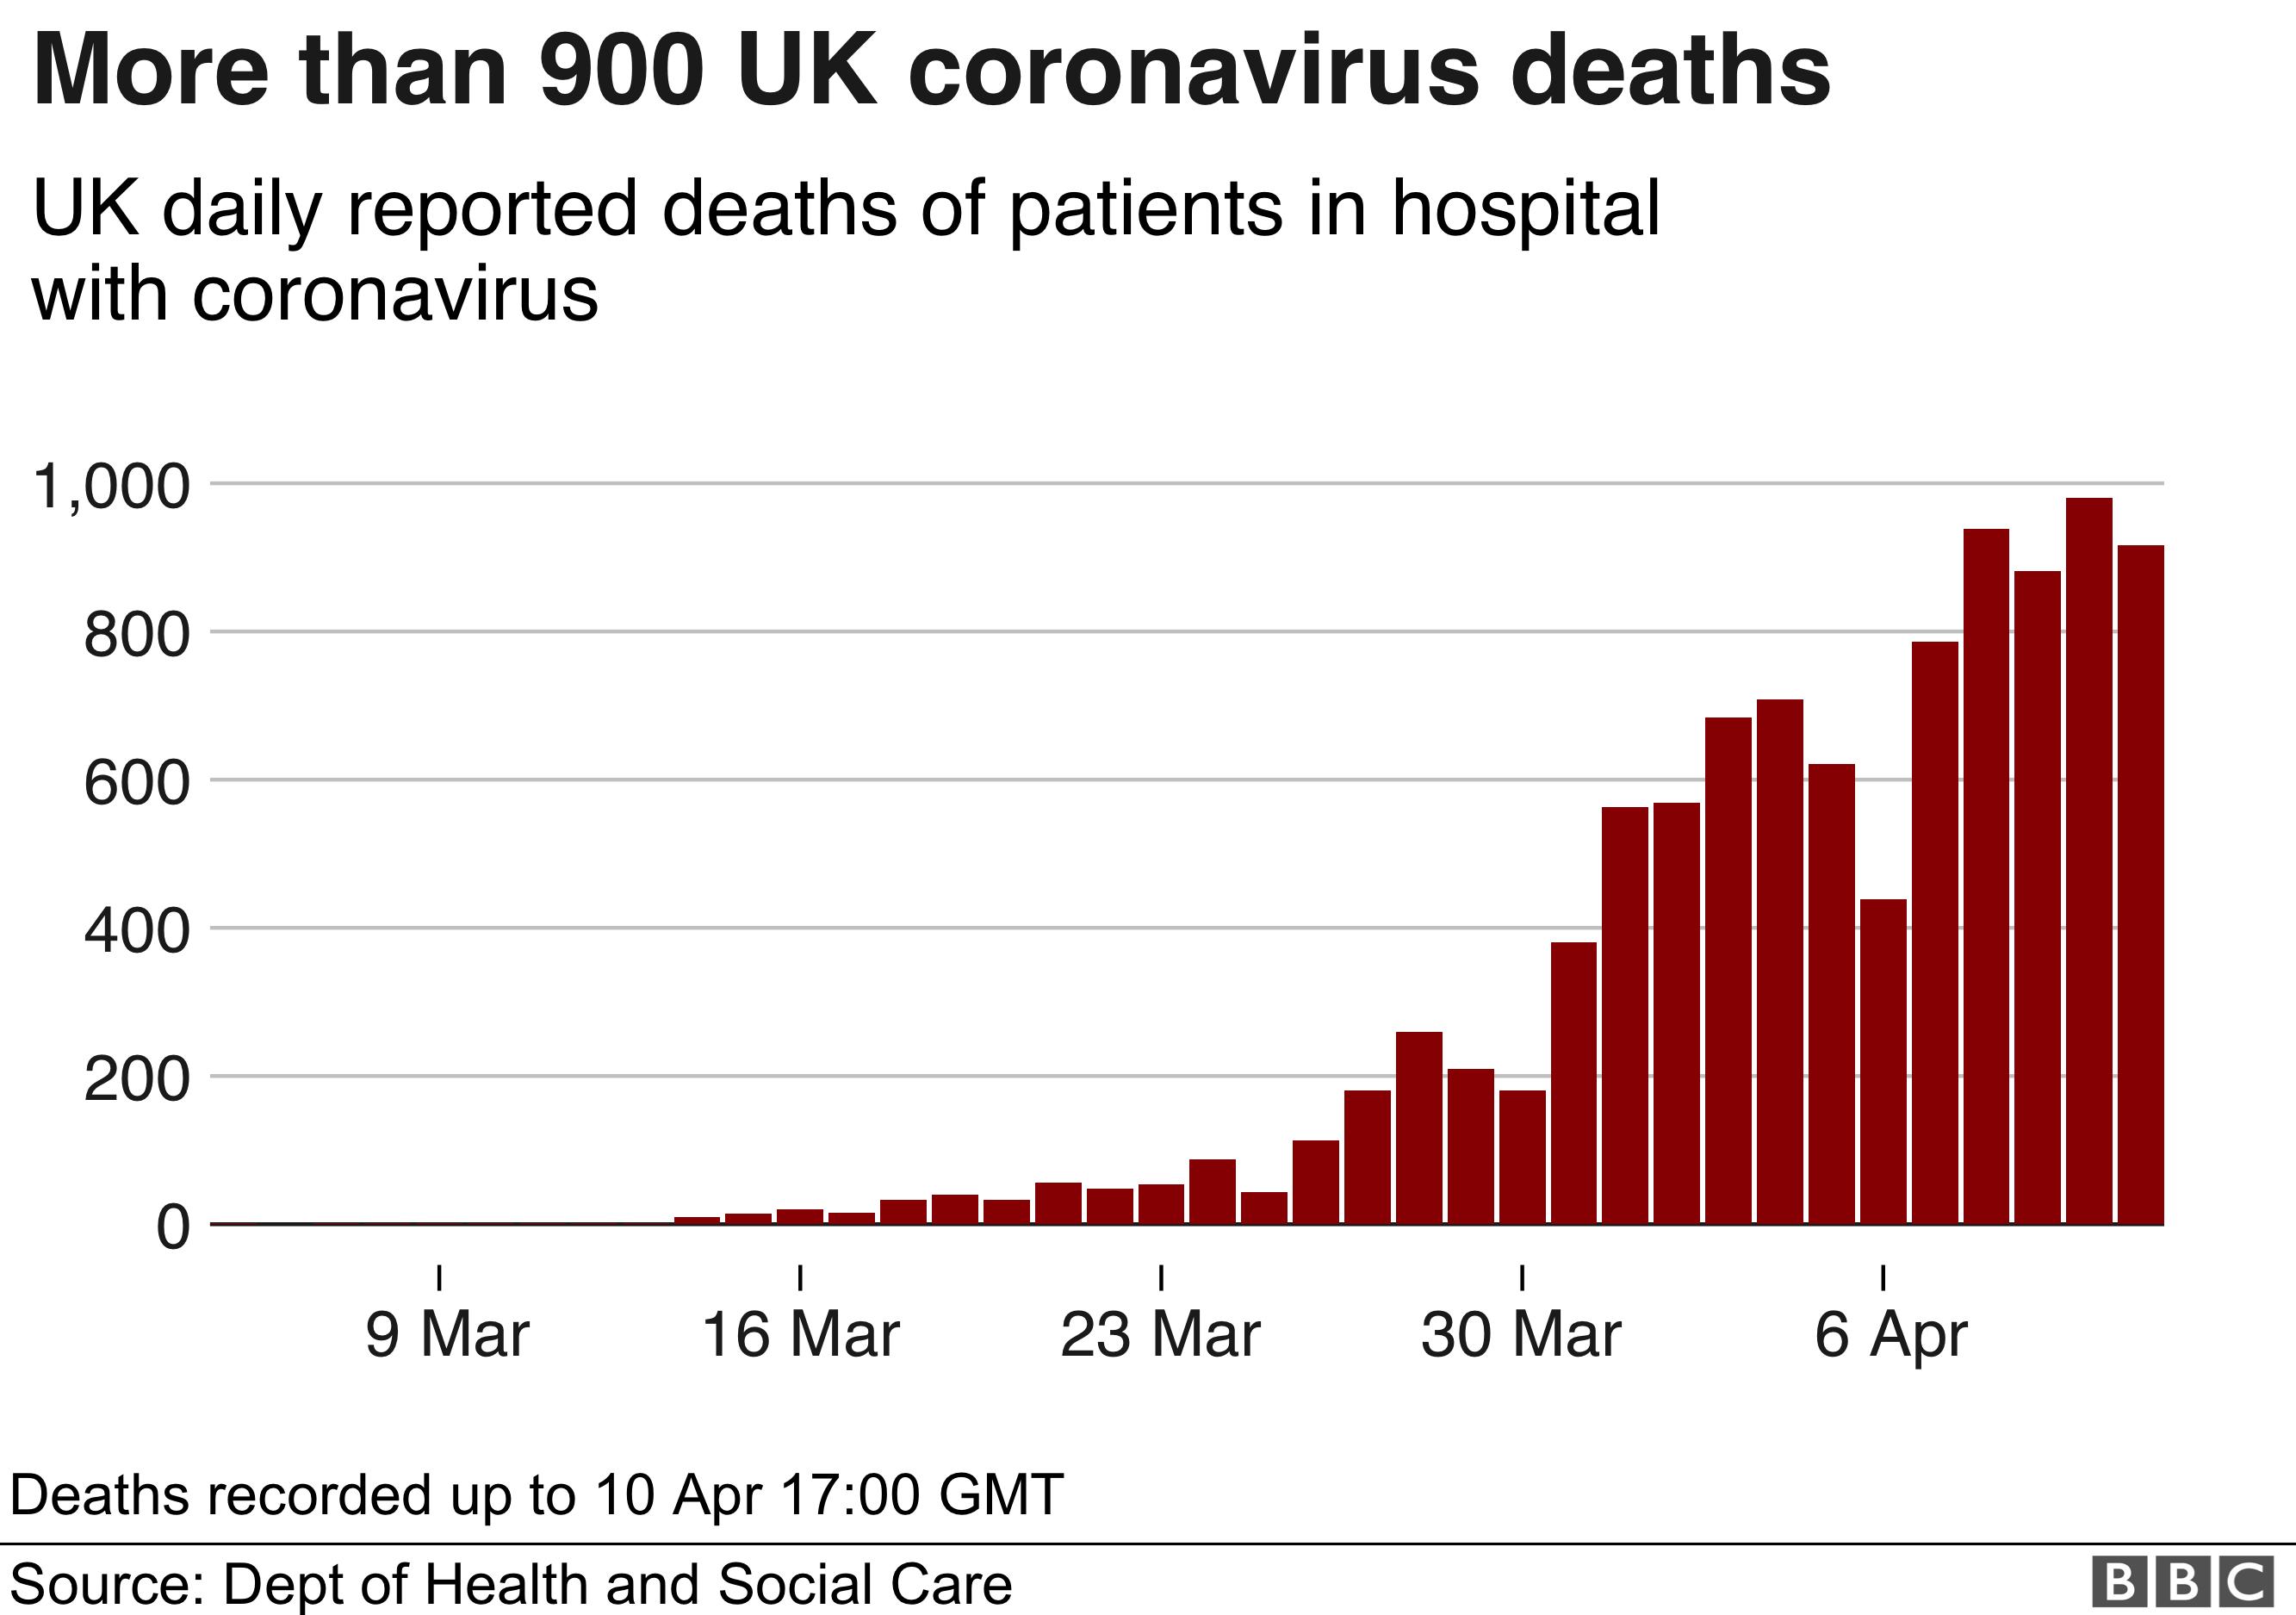 Graph showing UK daily hospital coronavirus deaths